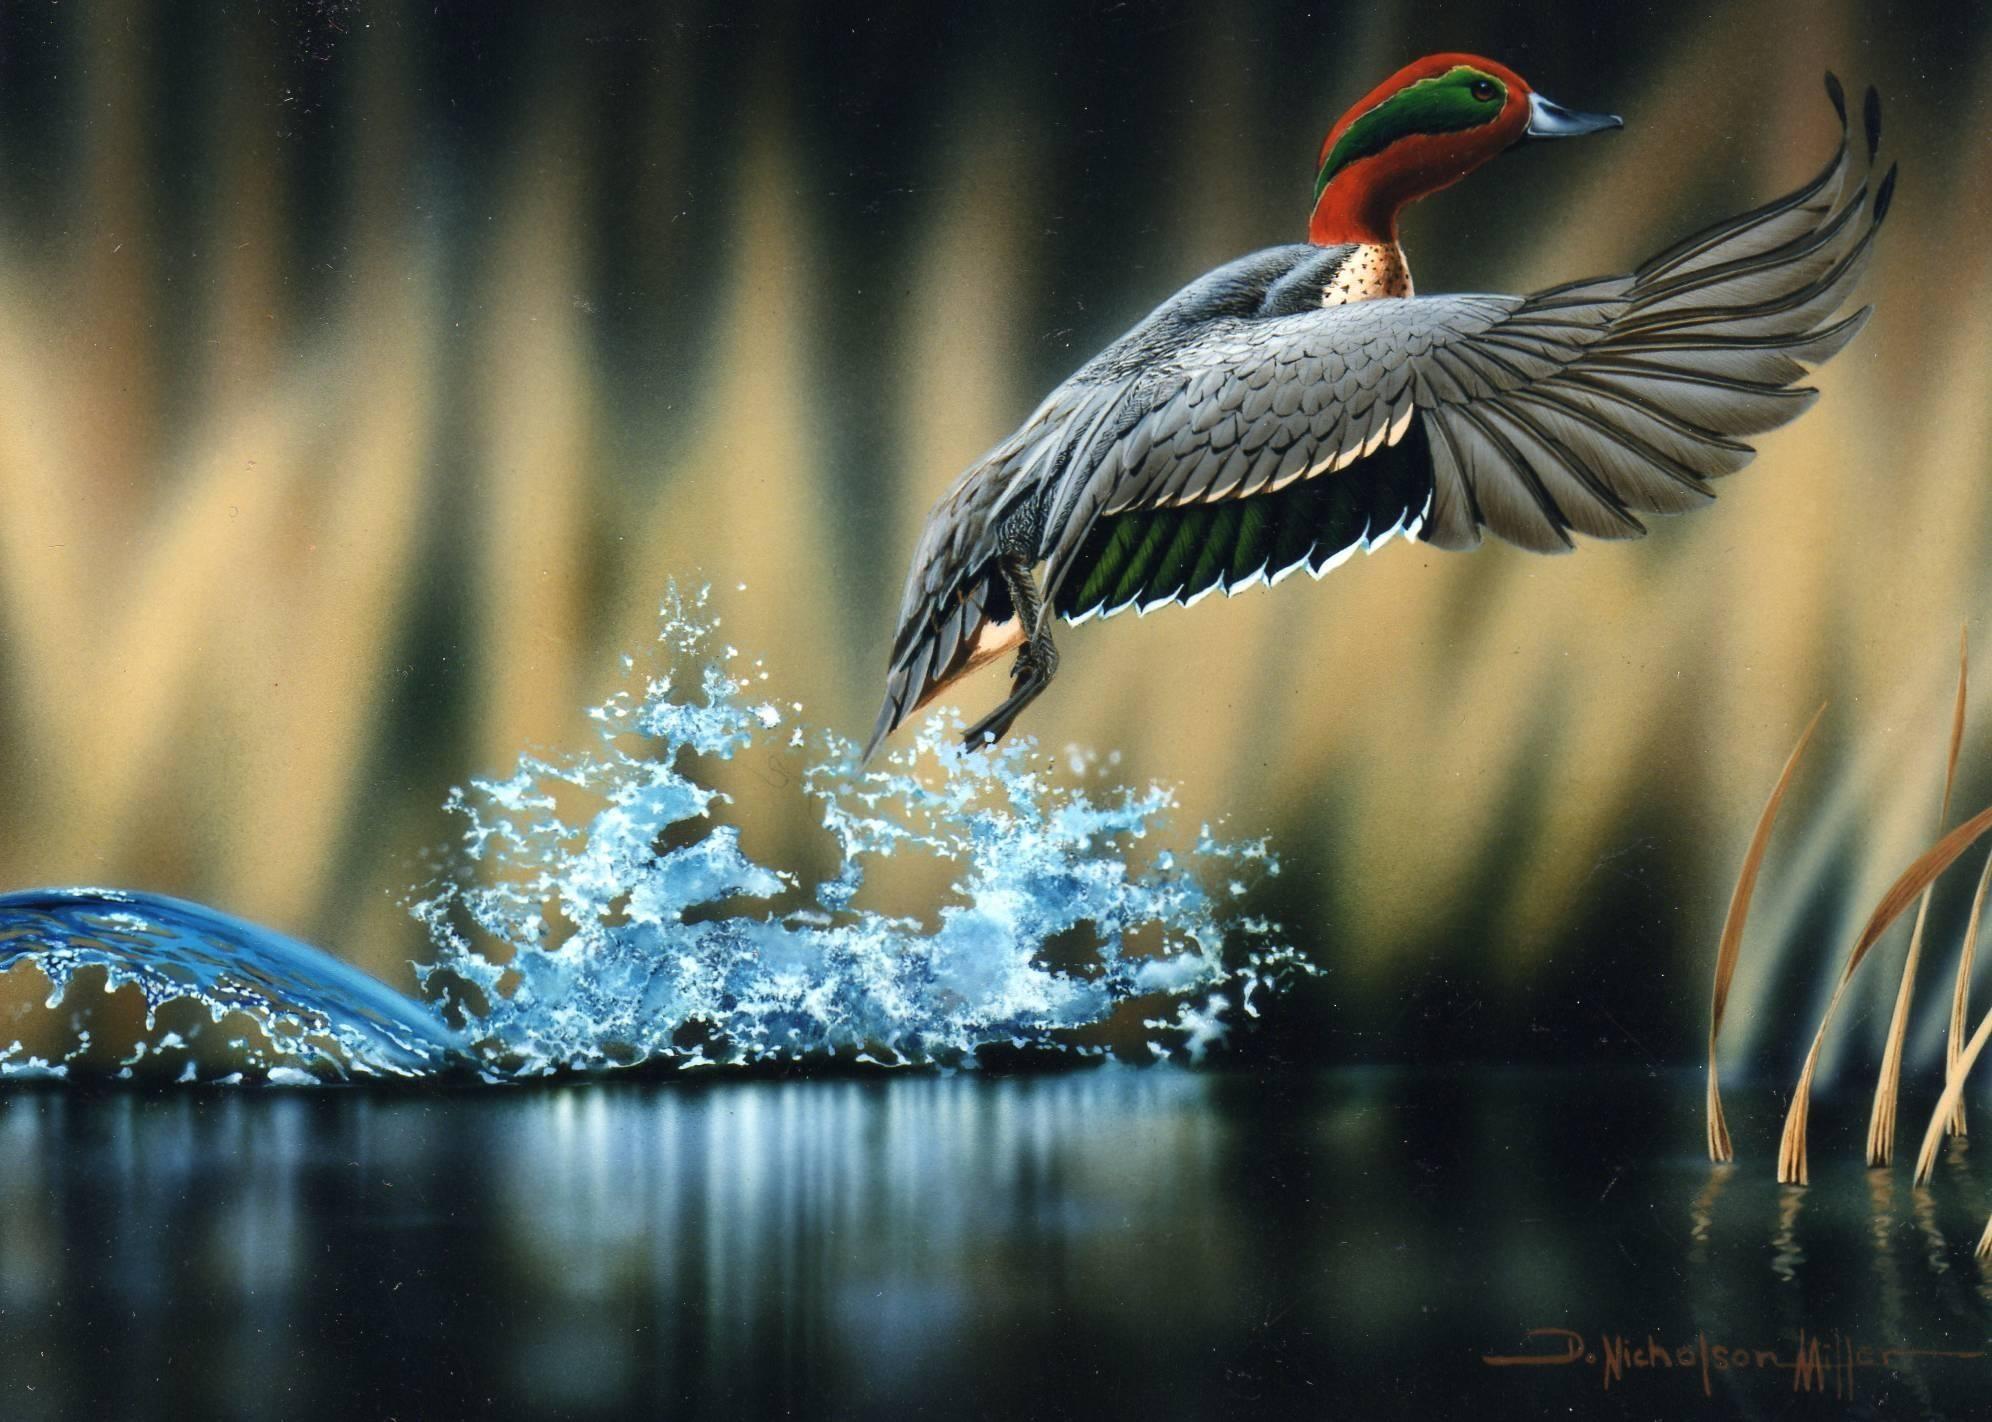 Hd Waterfowl Wallpaper Data Src Amazing Wildlife Photography 1992x1422 Download Hd Wallpaper Wallpapertip